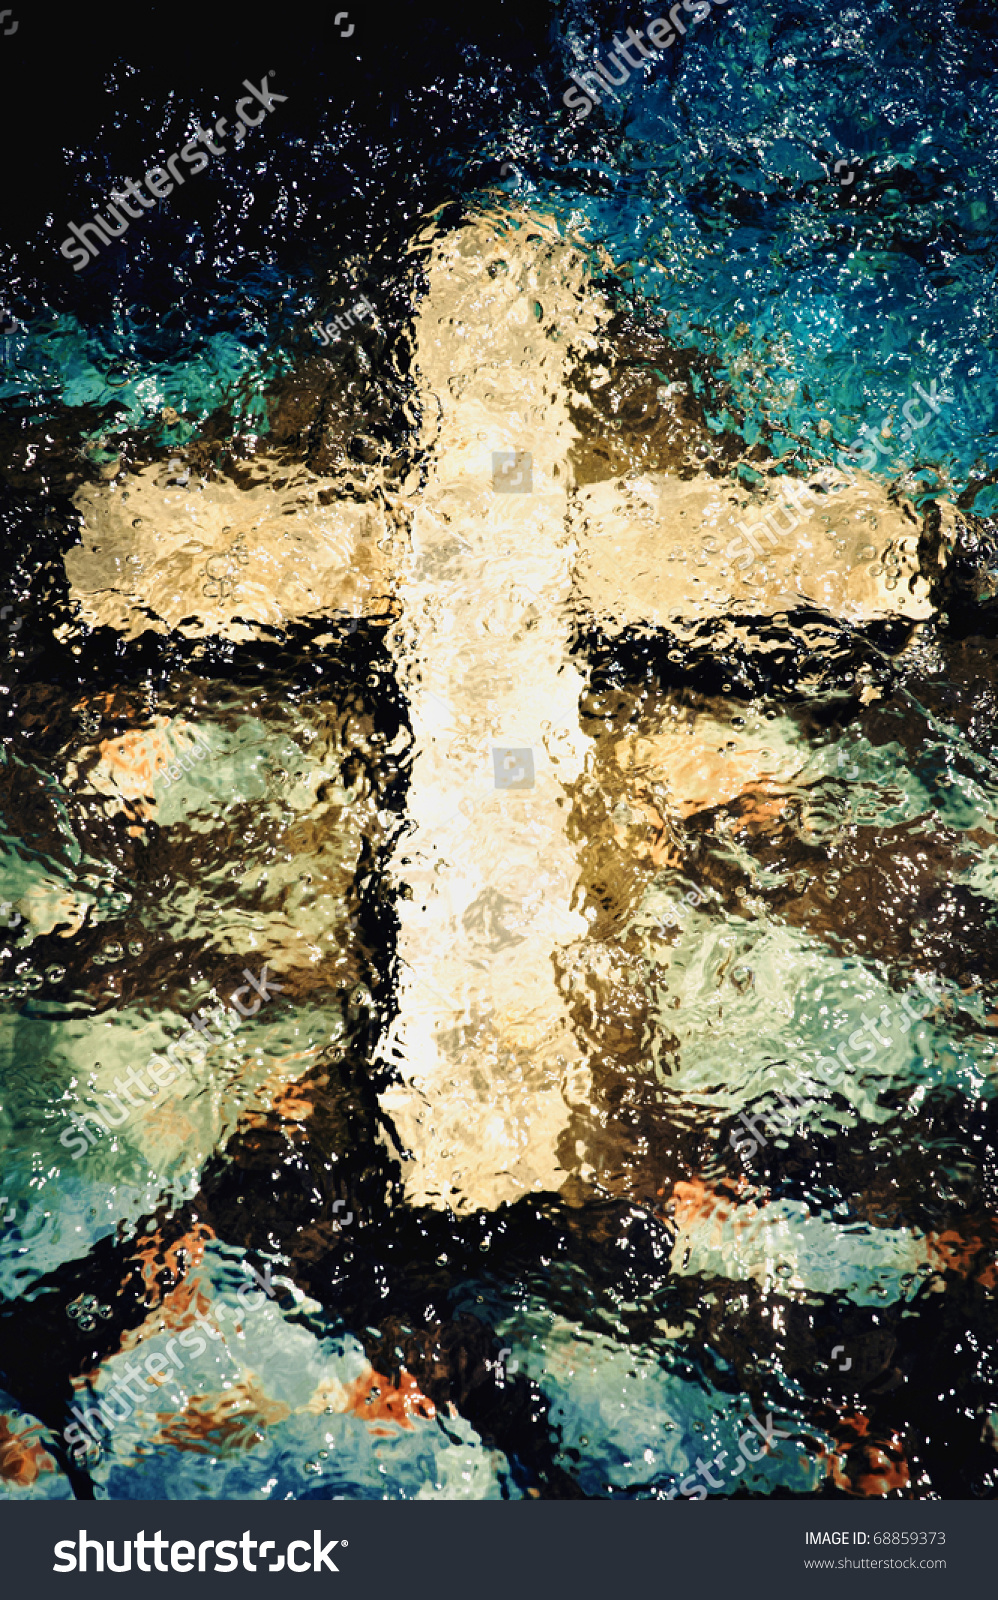 Religious christmas music background